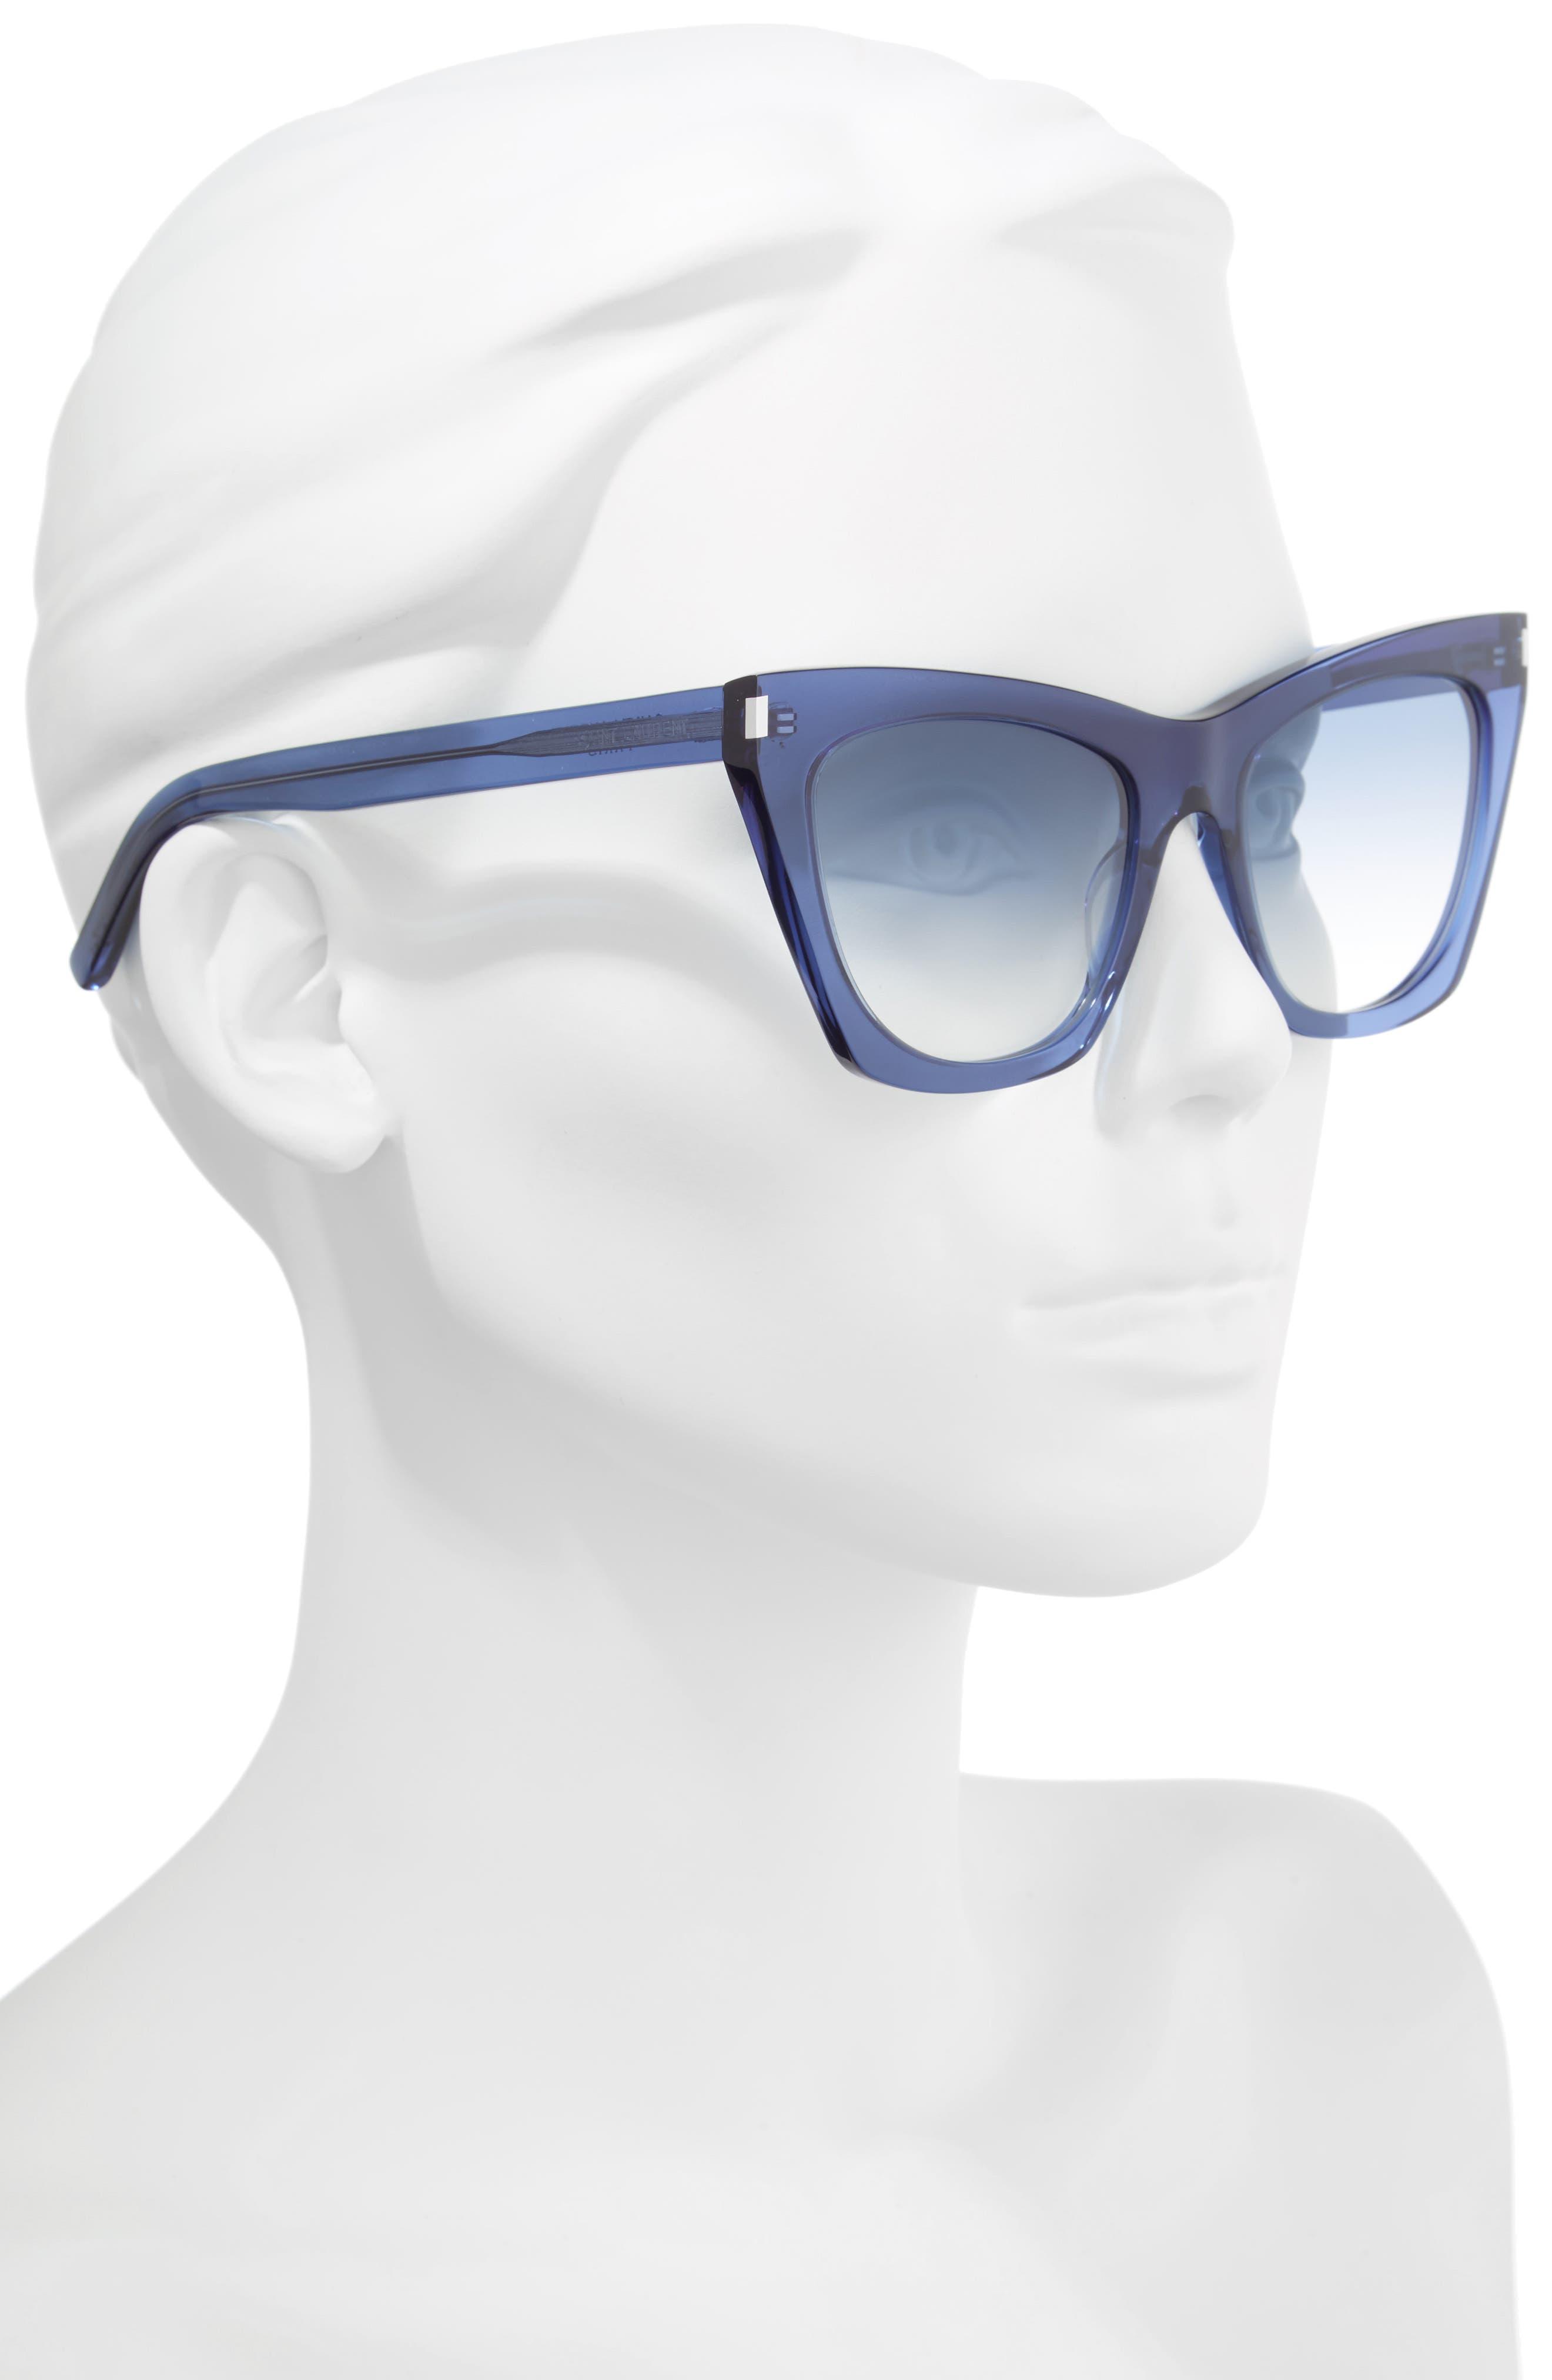 Kate 55mm Cat Eye Sunglasses,                             Alternate thumbnail 2, color,                             Blue